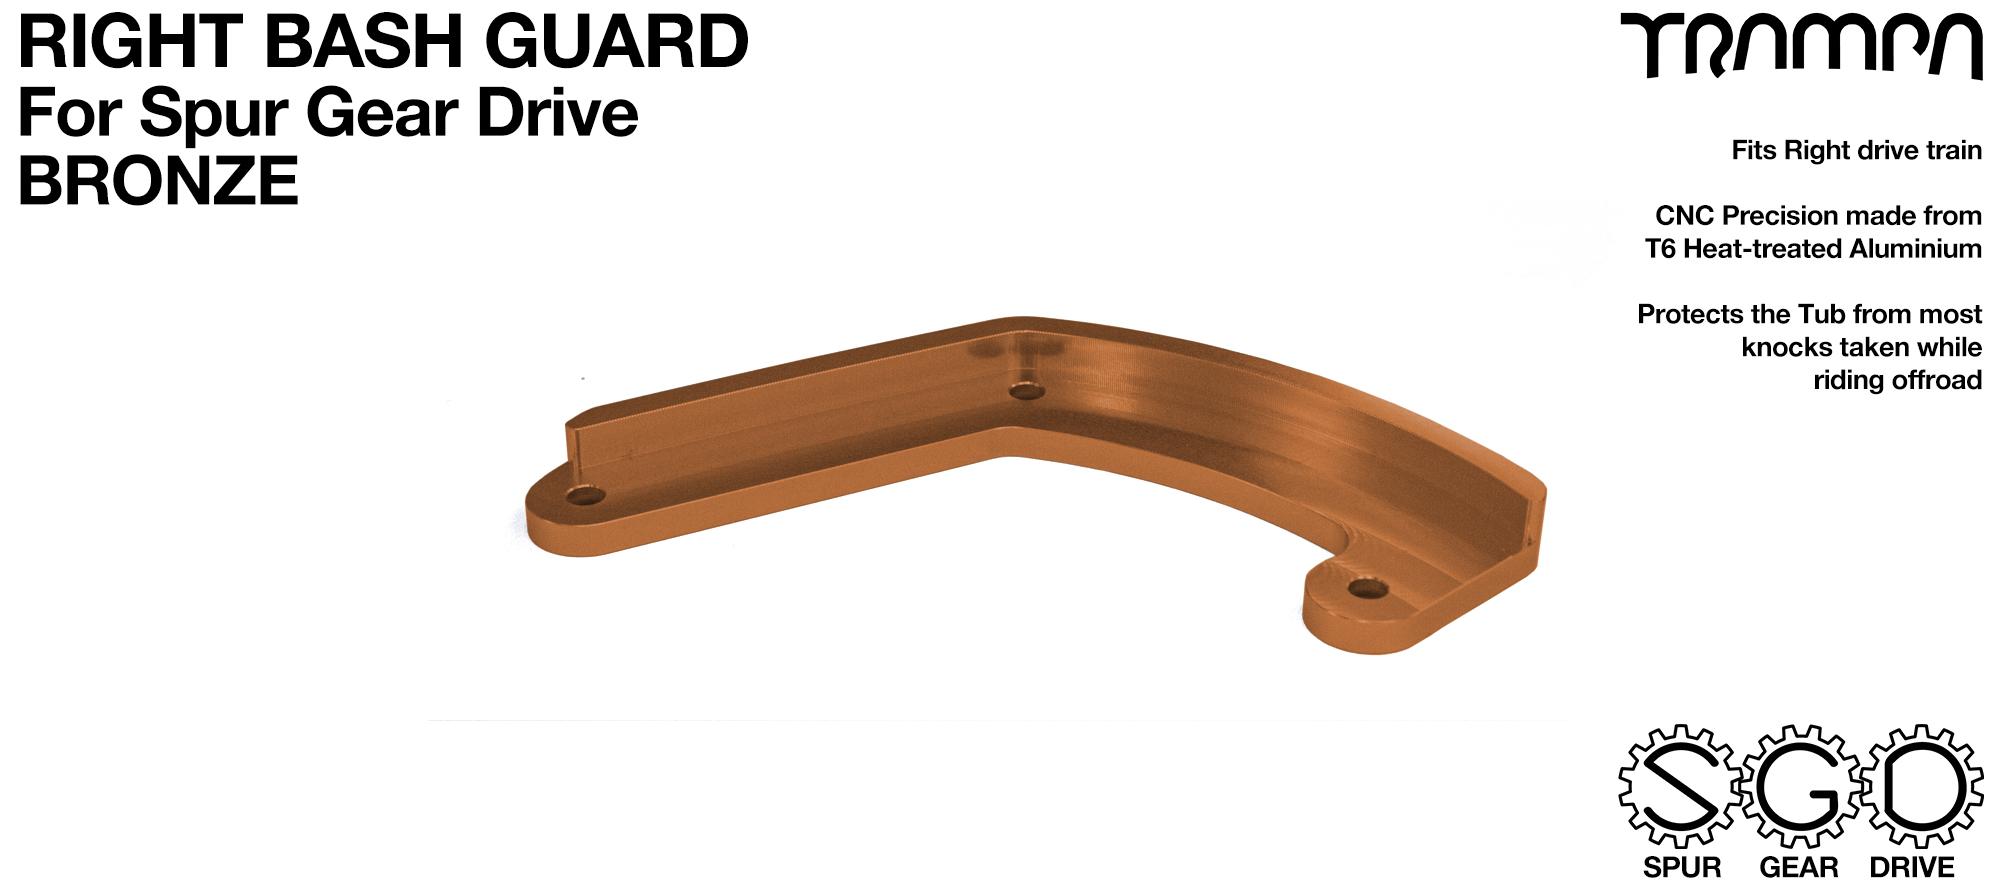 MkII Spur Gear Drive Bash Guard - RIGHT Side - BRONZE